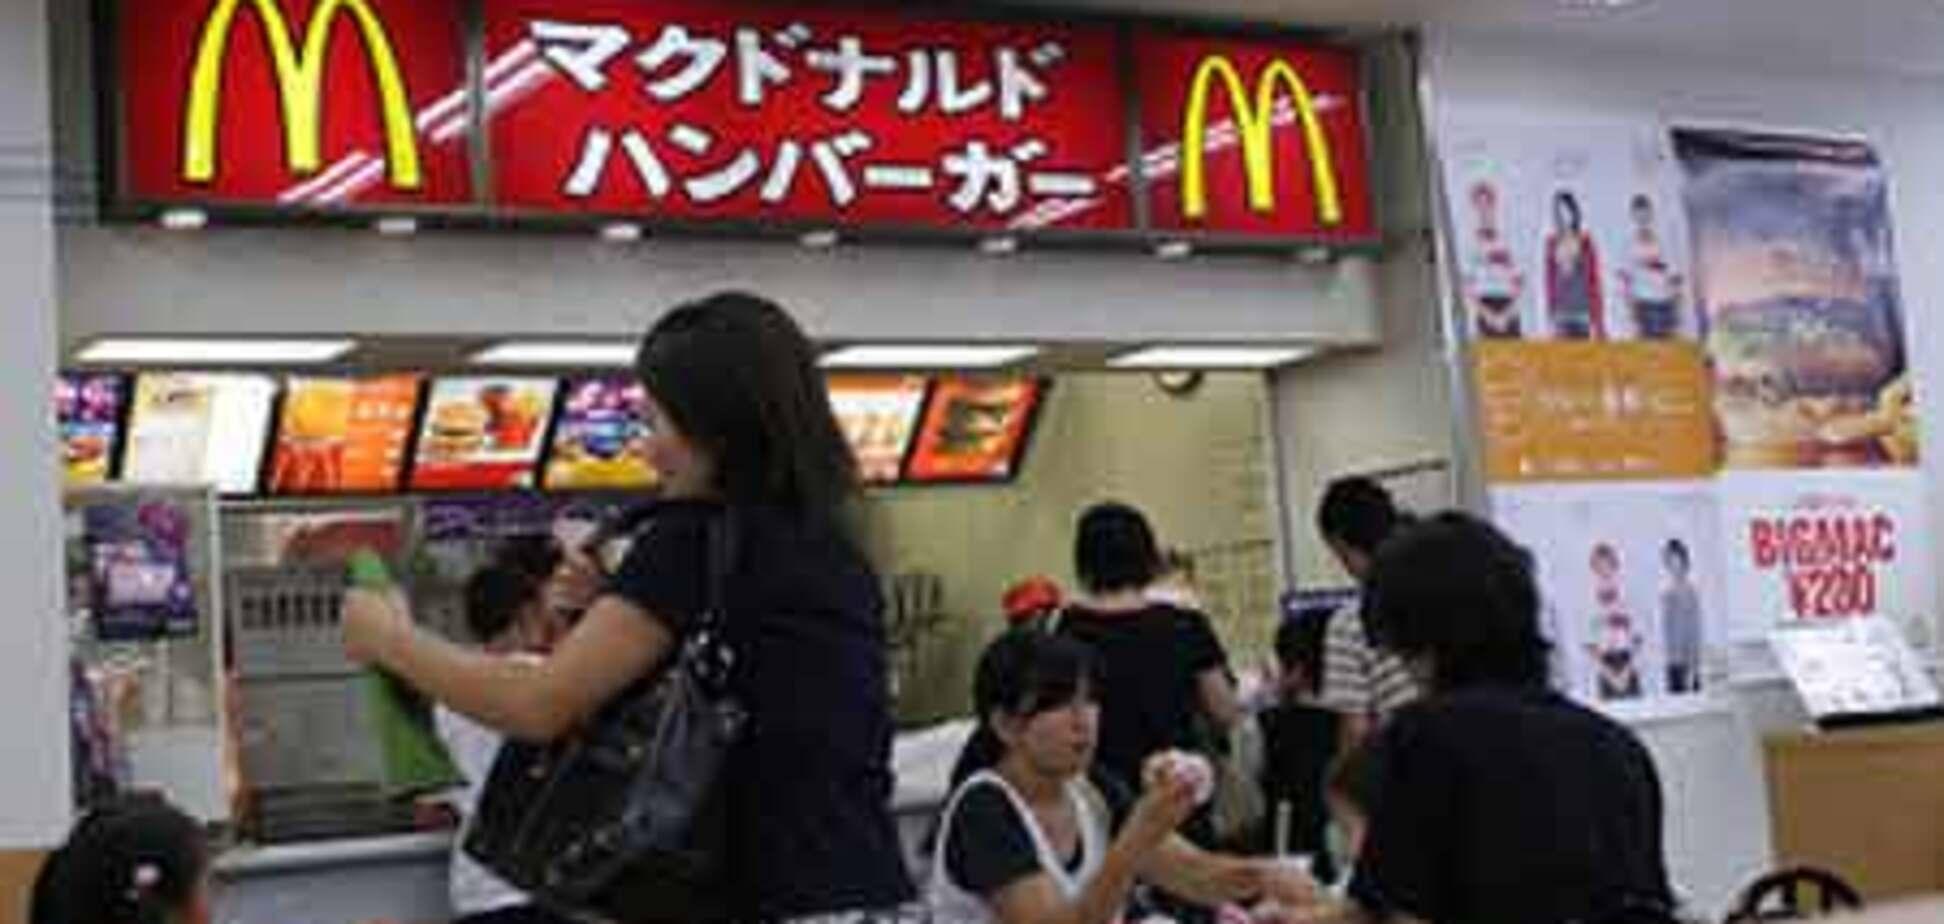 Трудоголизм погубил сотрудницу McDonald's